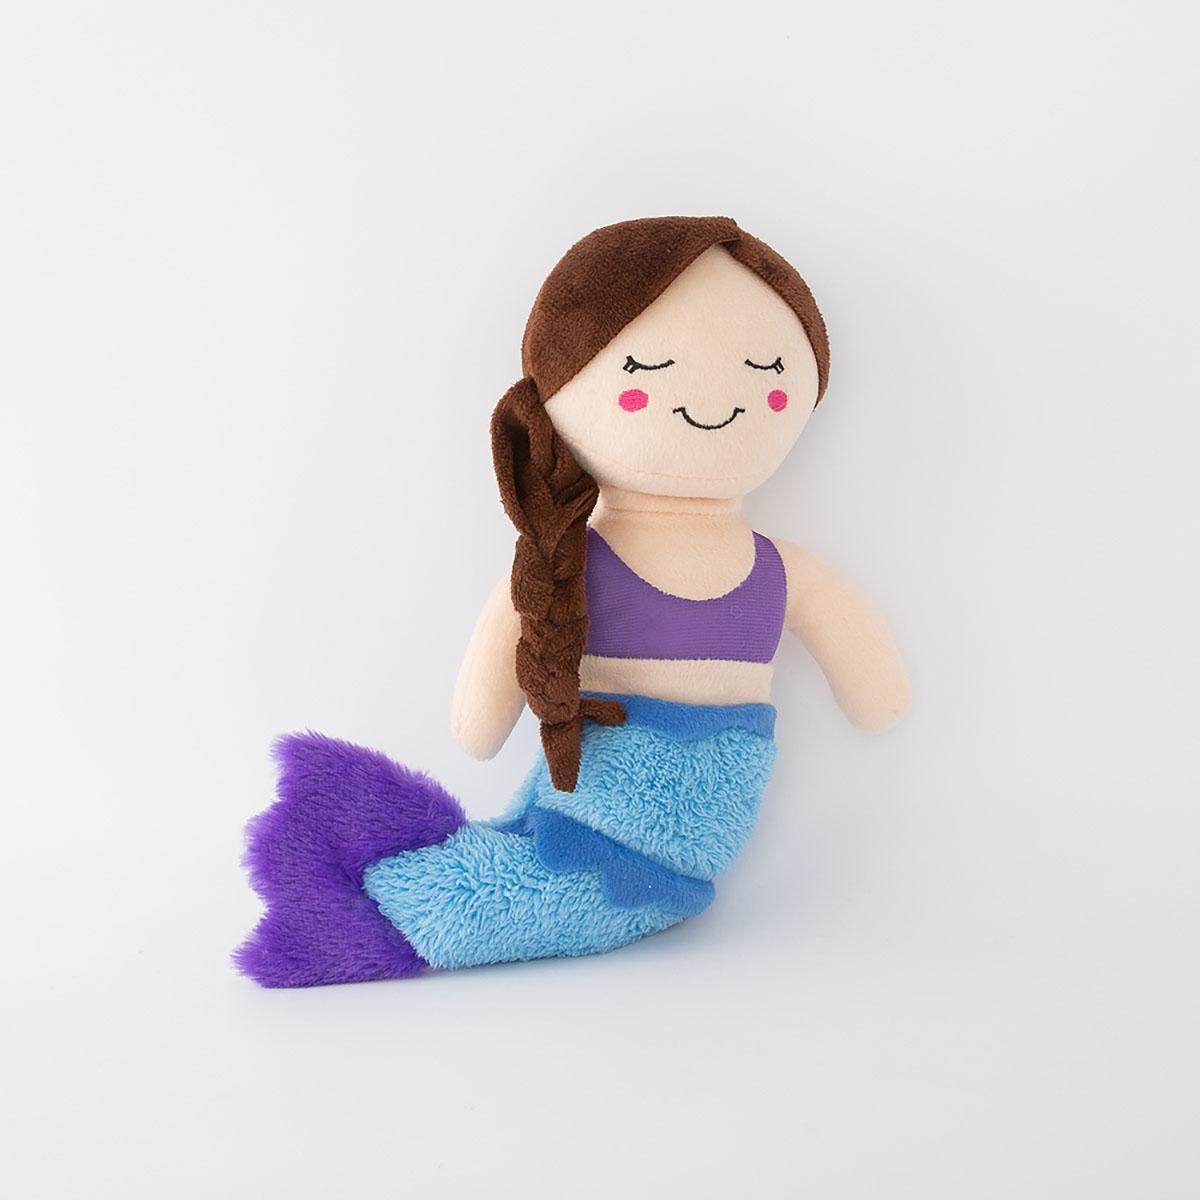 ZippyPaws Storybook Snugglerz Dog Toy - Maddy the Mermaid